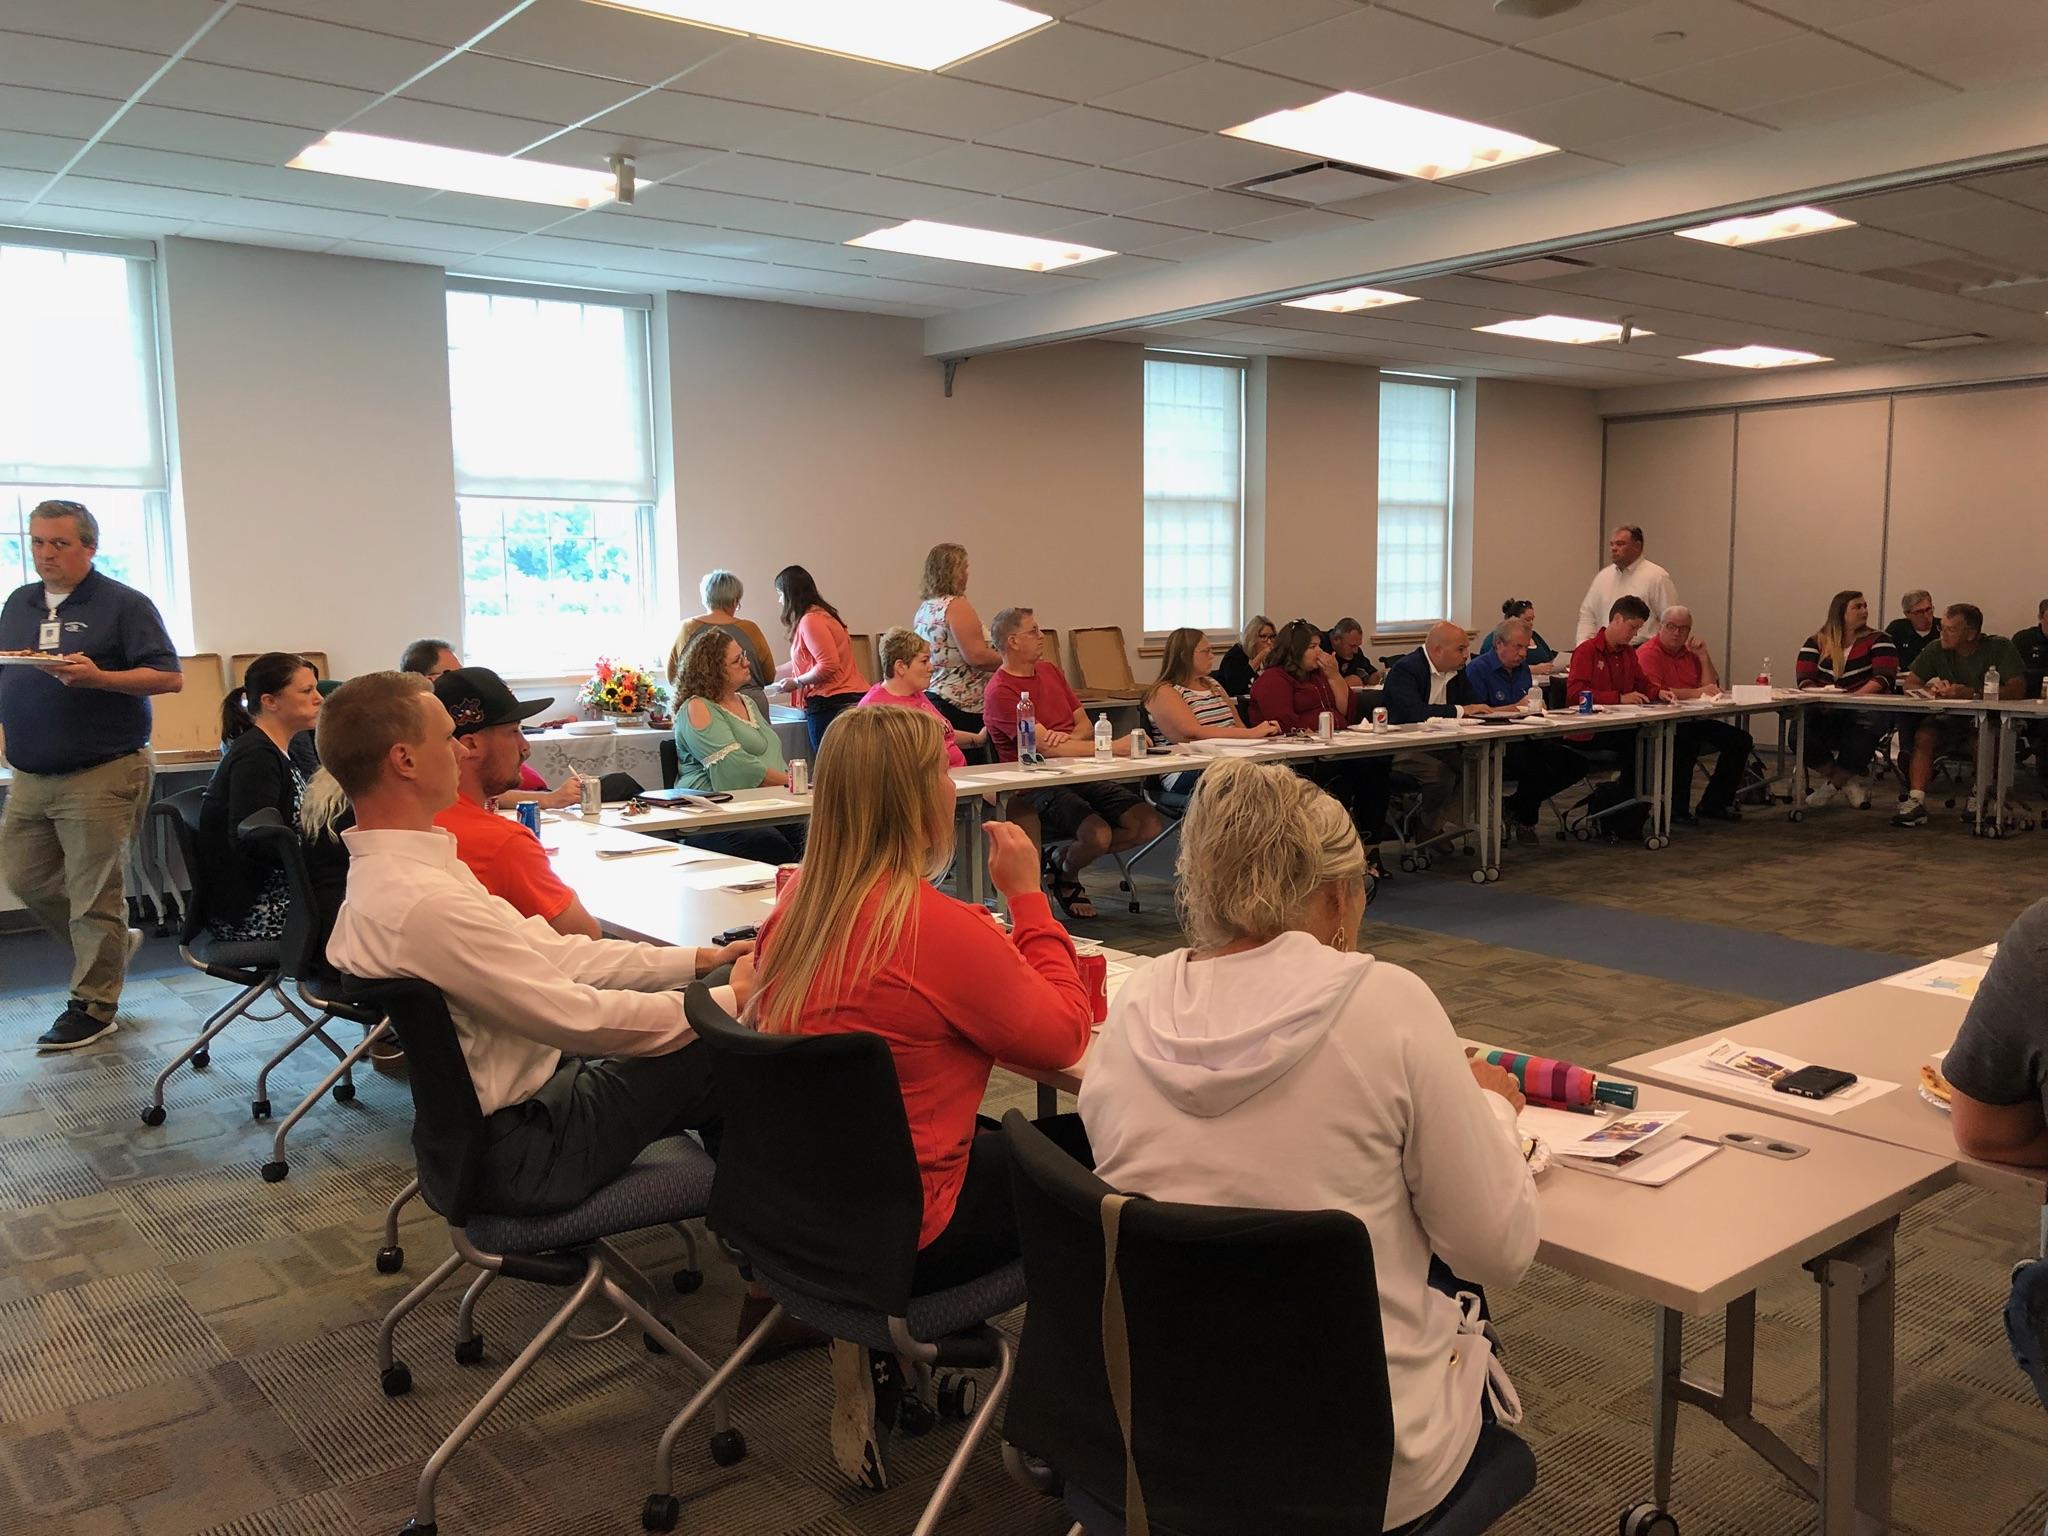 Vandalia ONE 1st Workforce Development Planning Meeting Draws Big Crowd